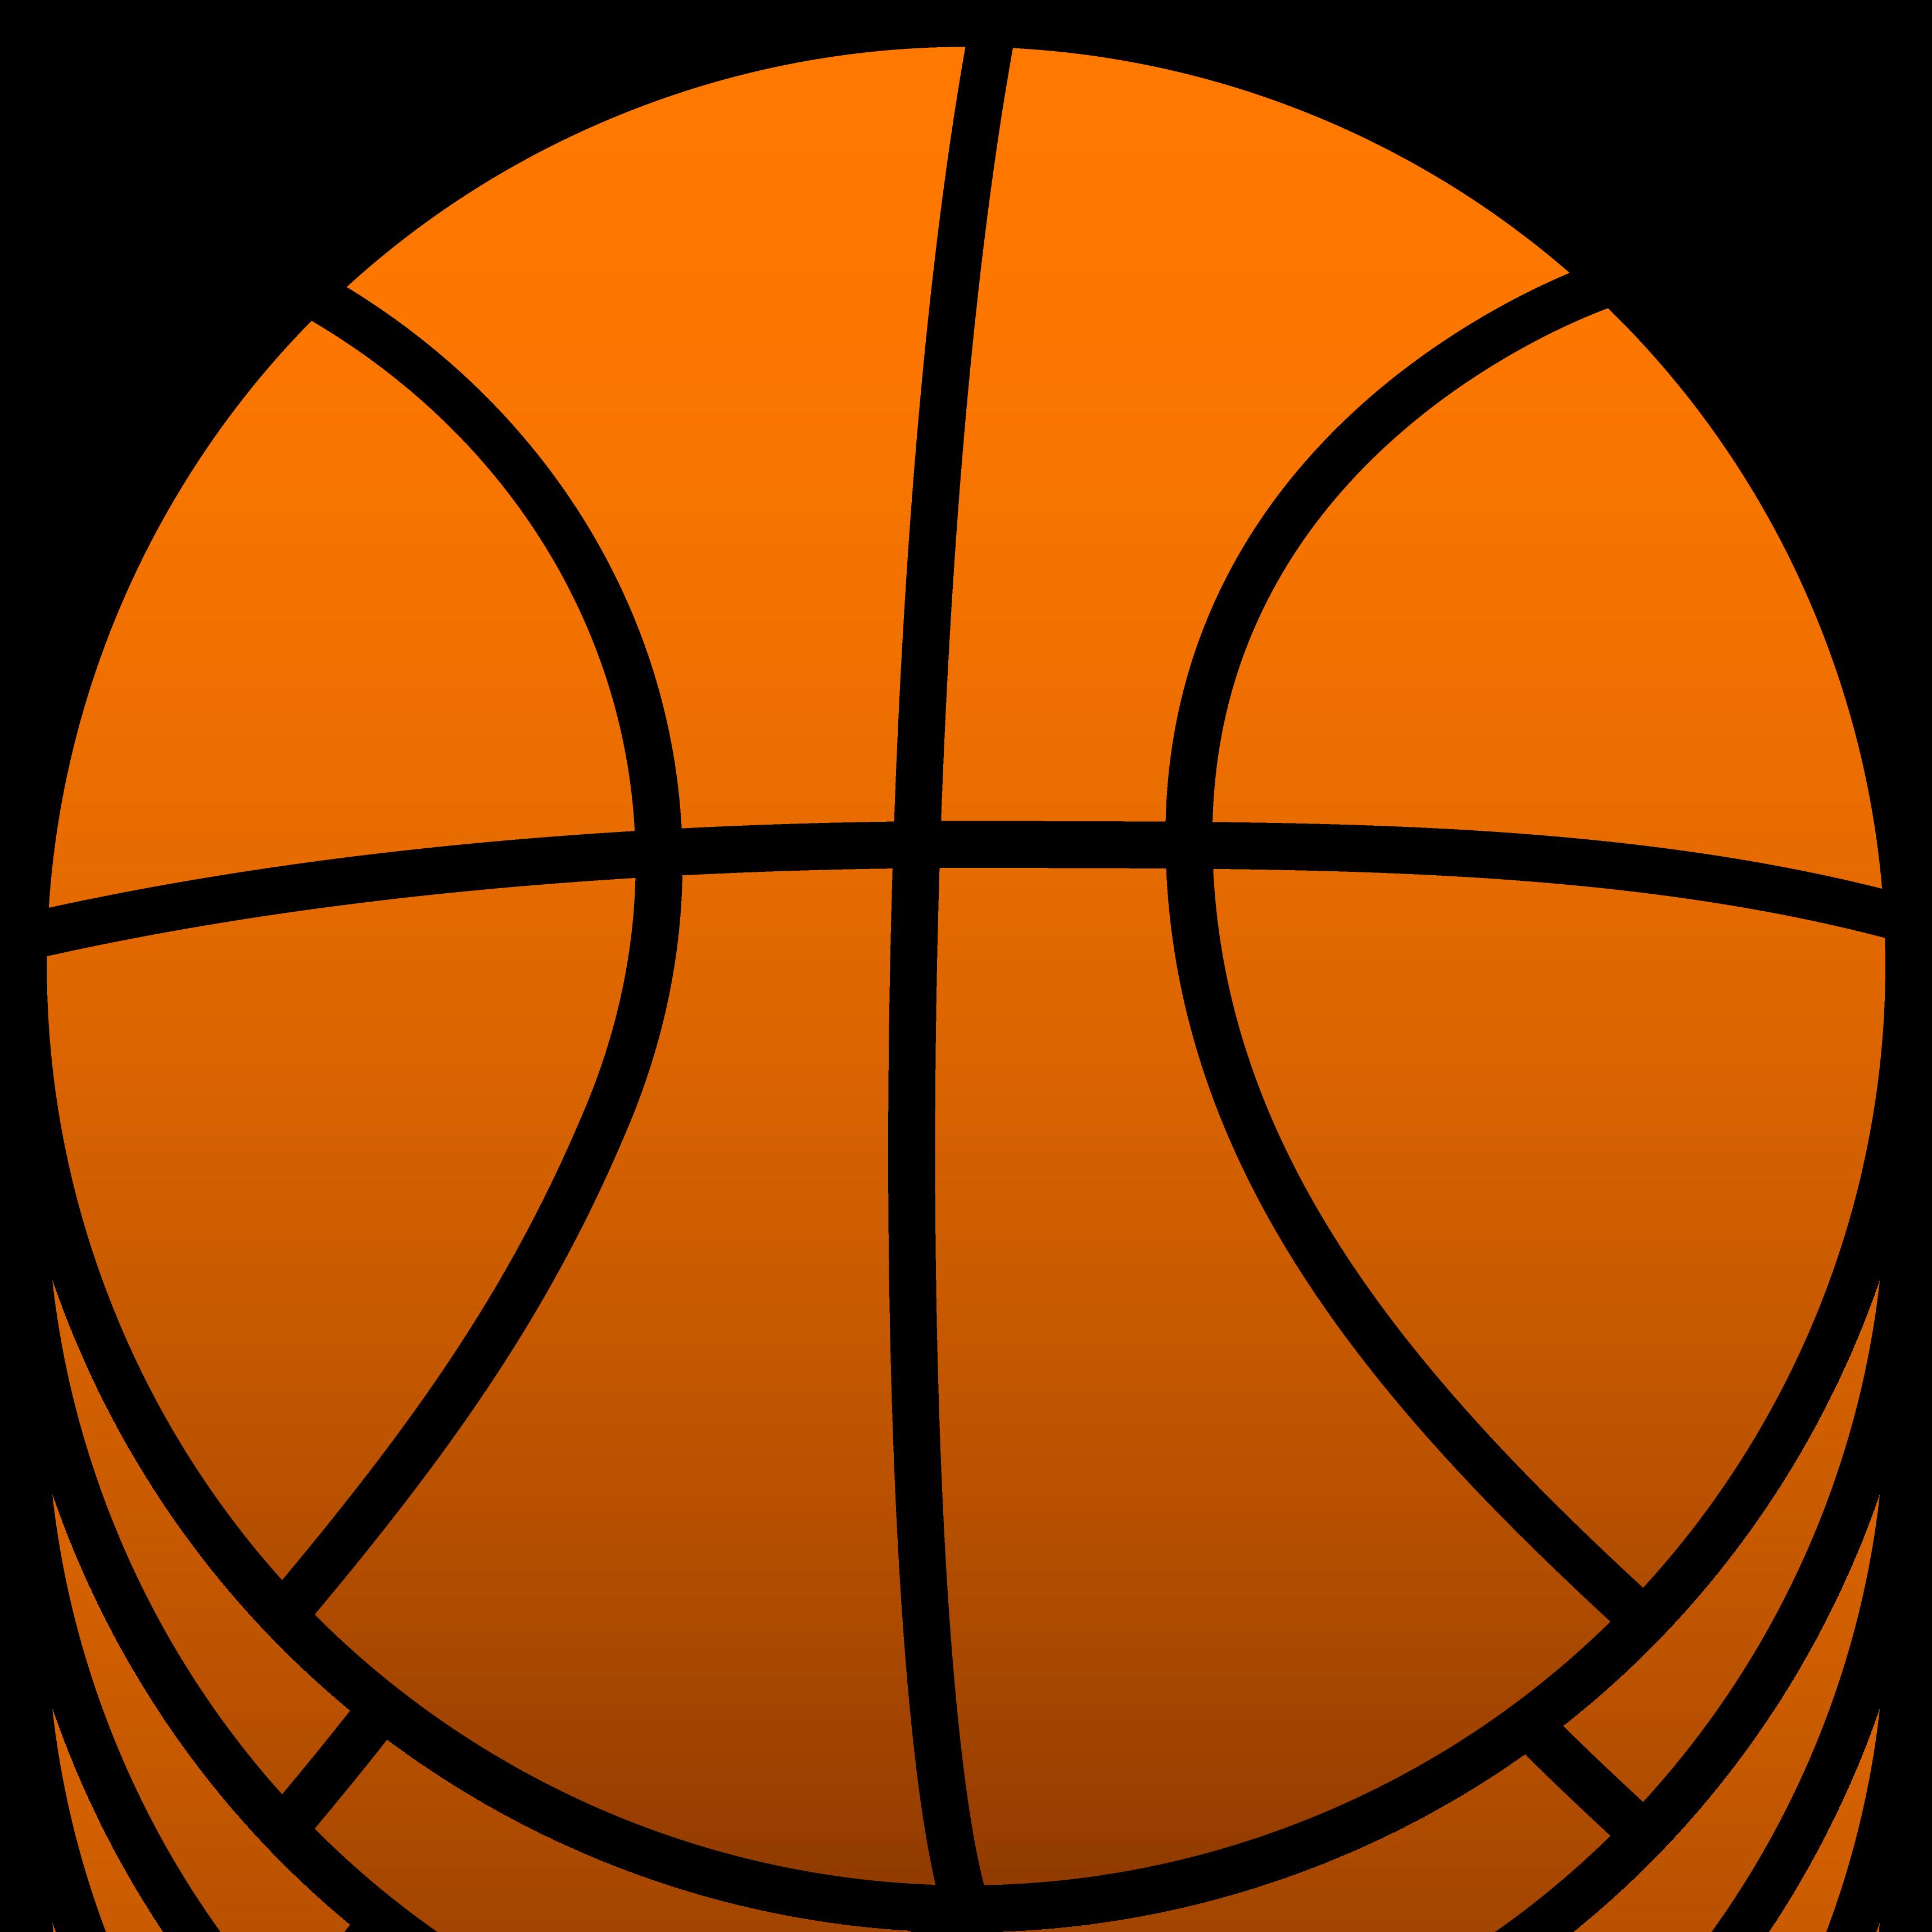 Basketball Scoreboard Clipart-basketball scoreboard clipart-2